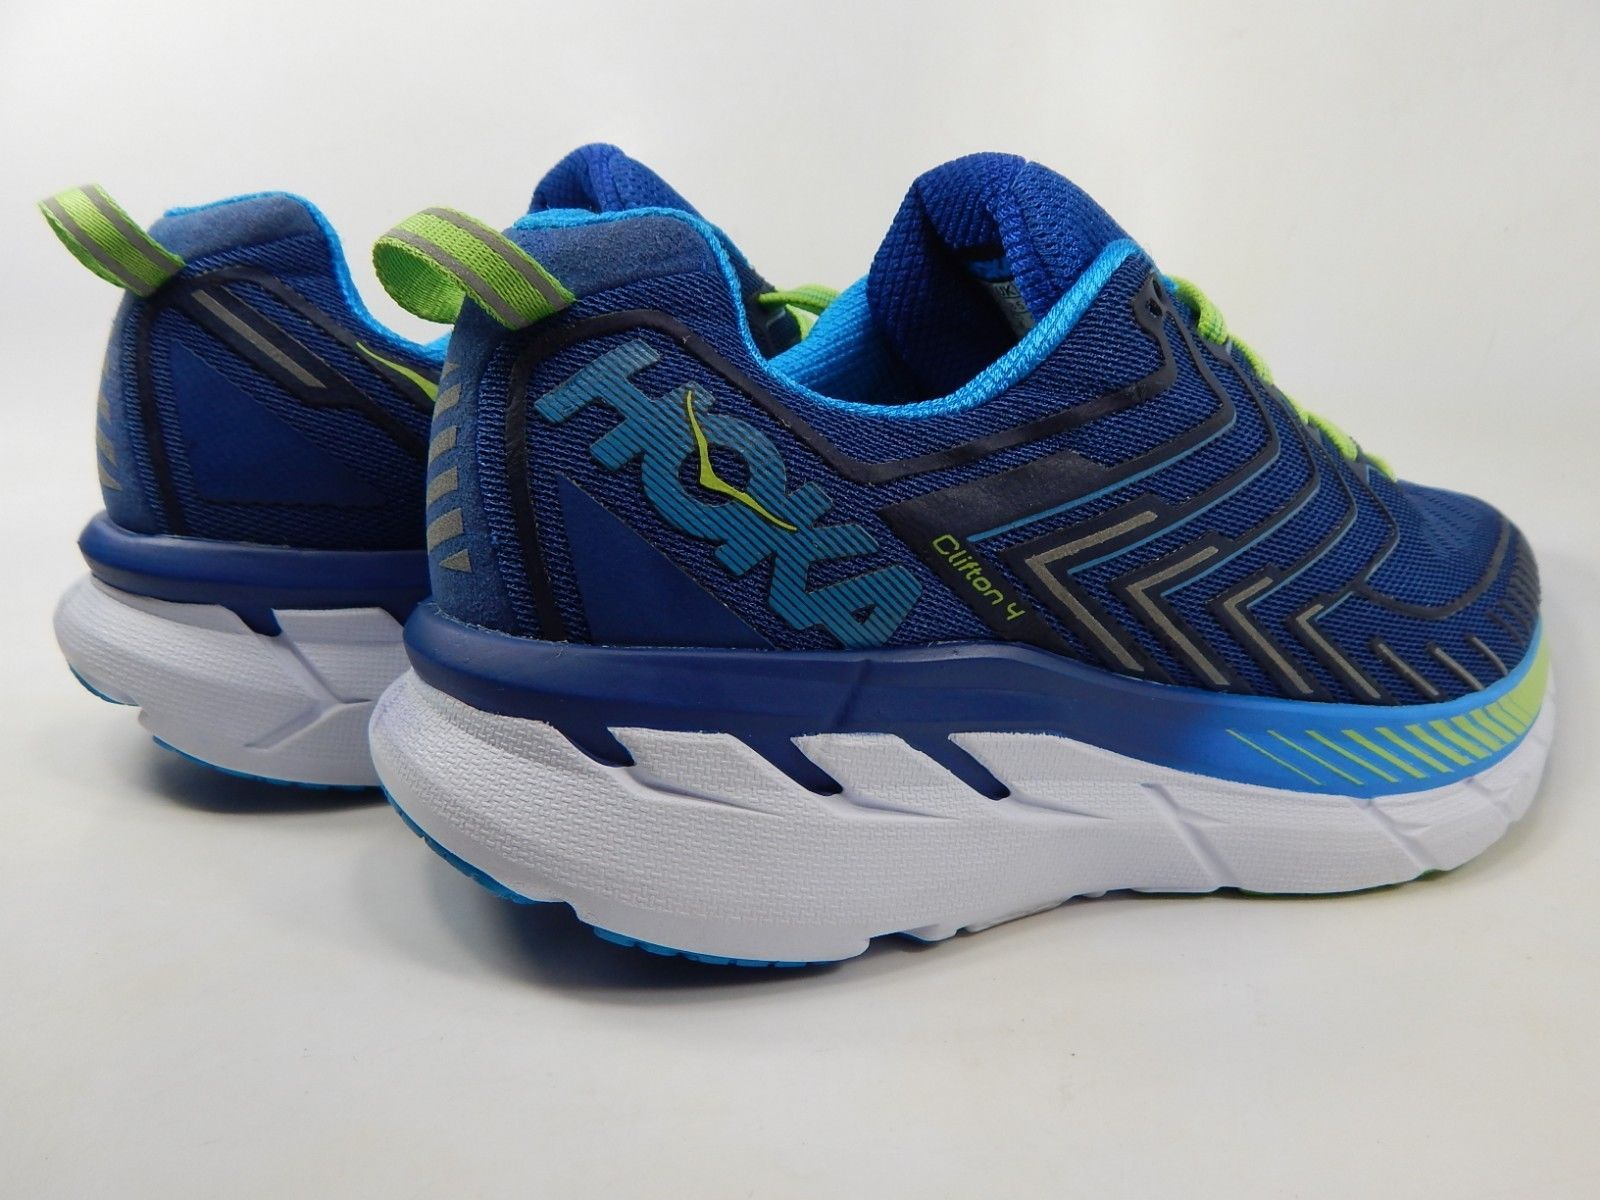 Hoka One One Clifton 4 Size 9 M (D) EU 42 2/3 Men's Running Shoes Blue 1016723